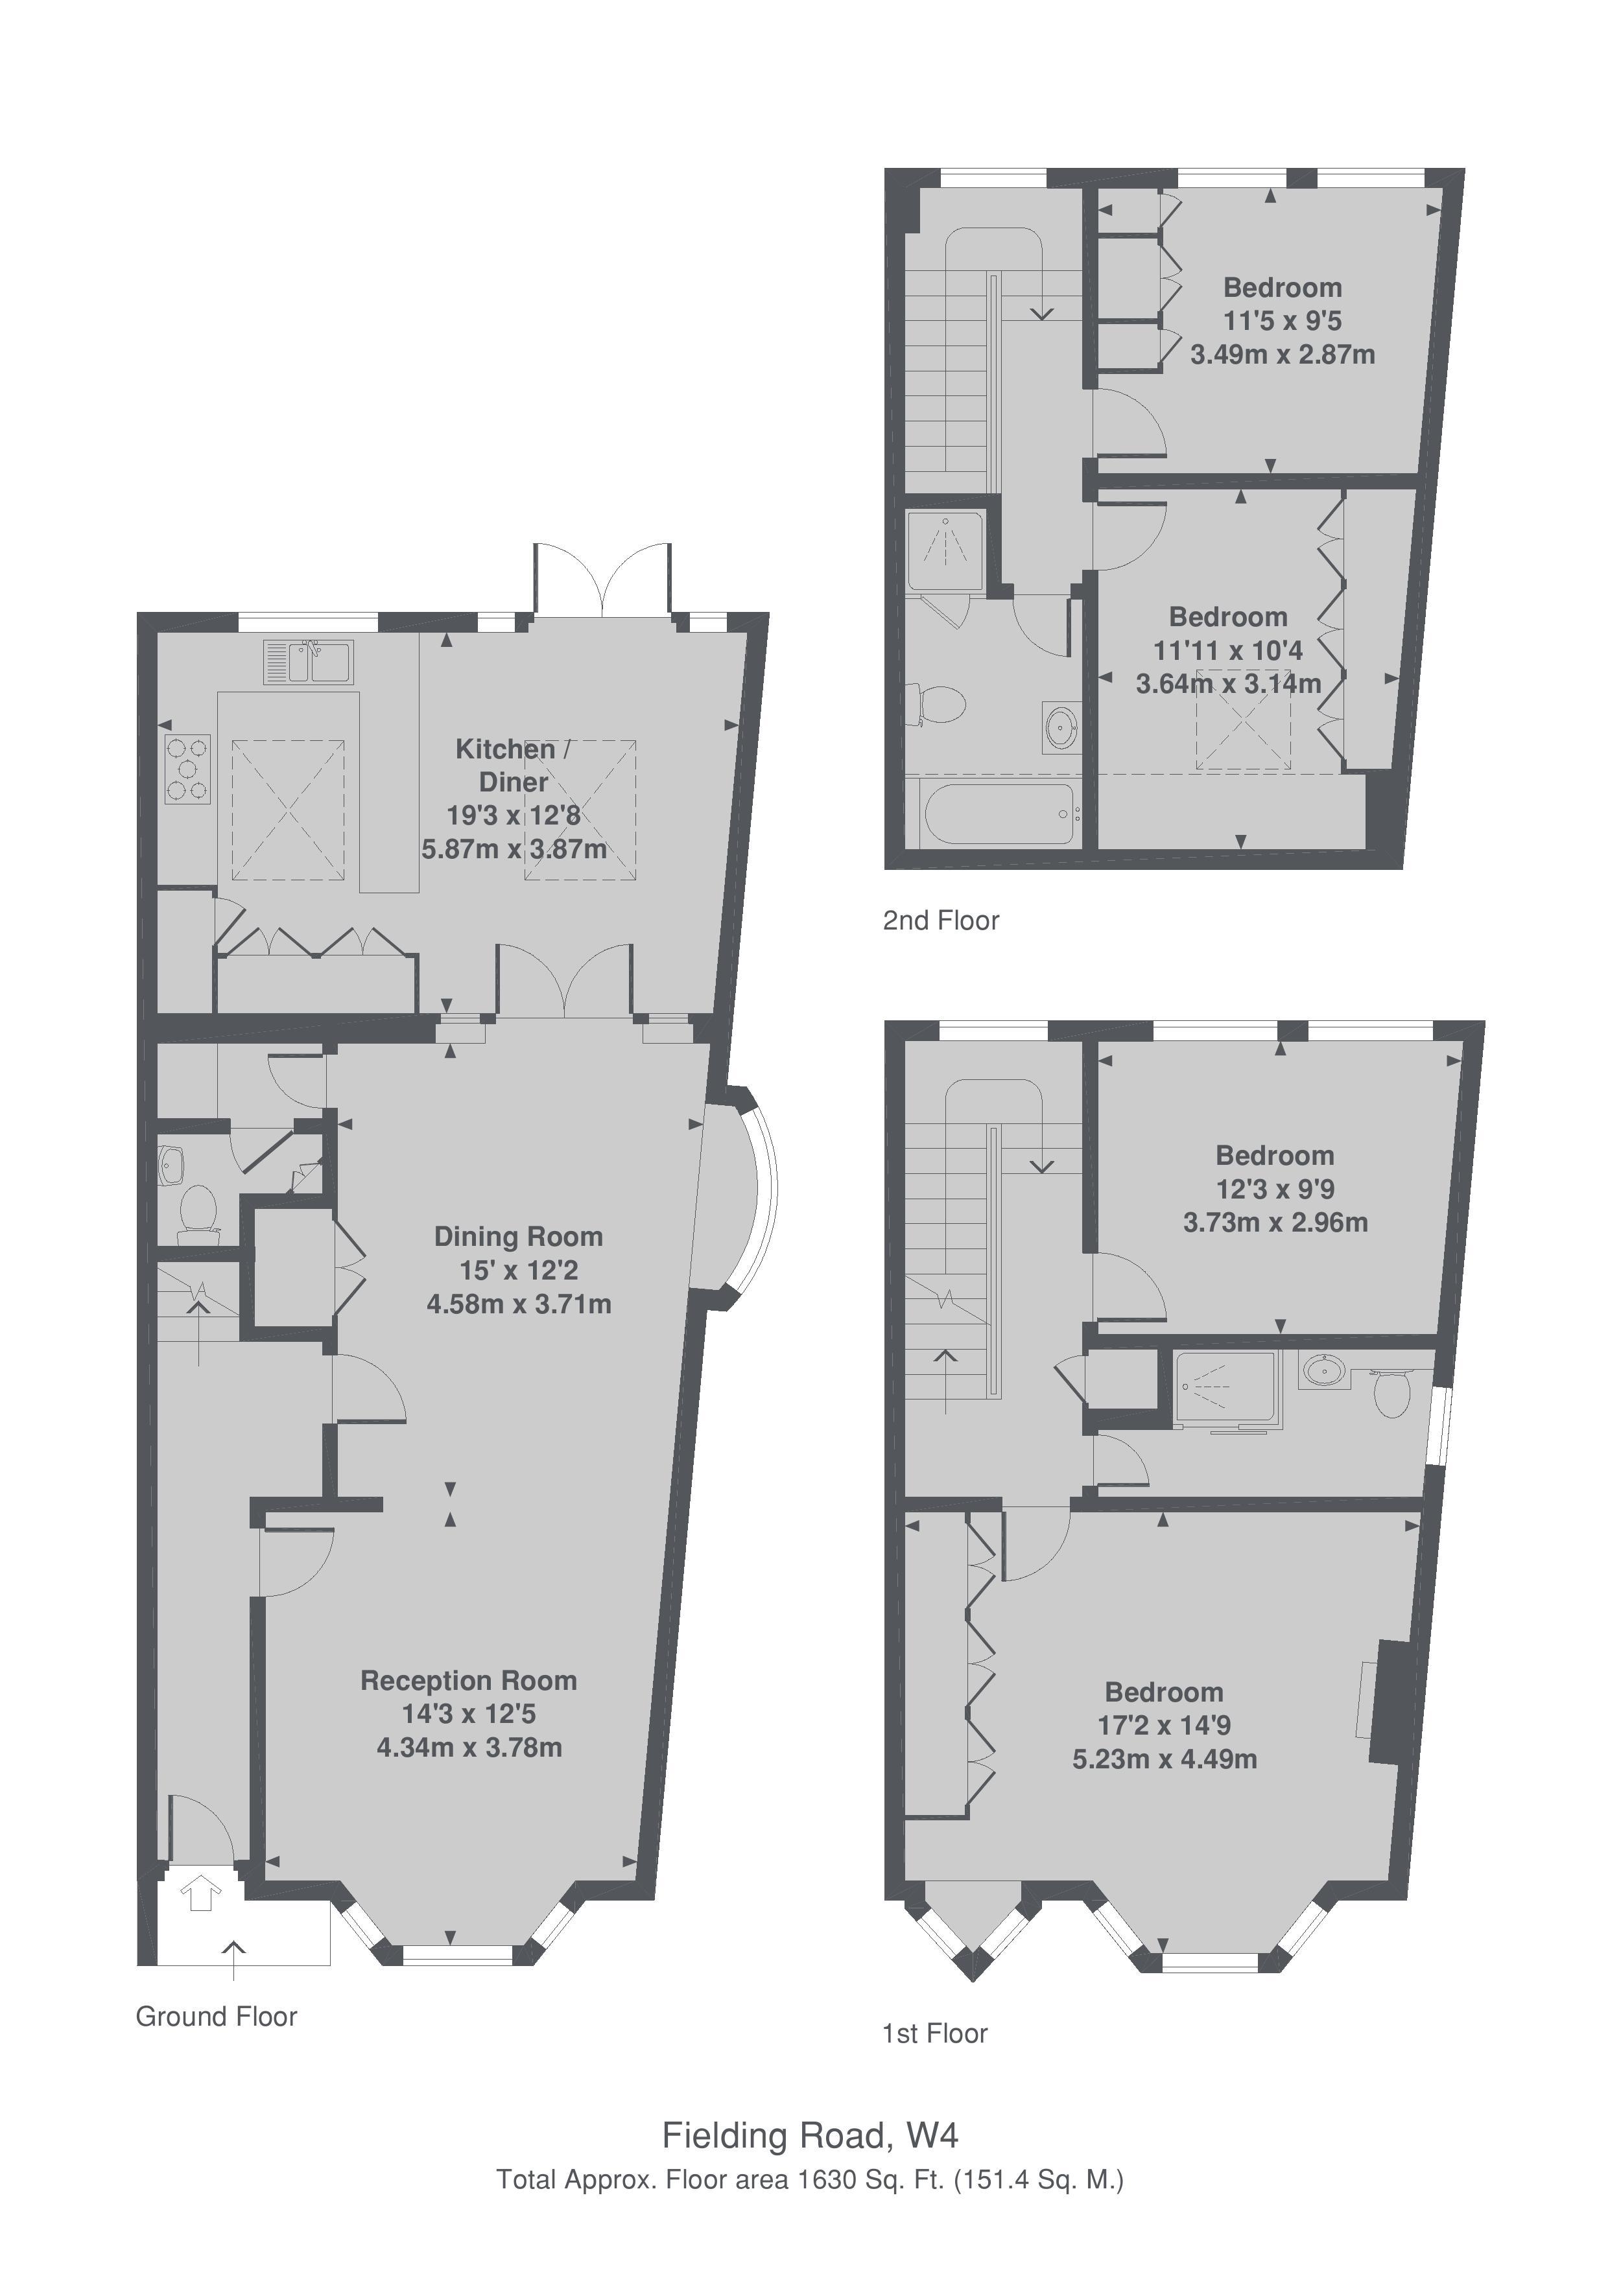 Fielding Road London W4 4 Bedroom Property To Rent